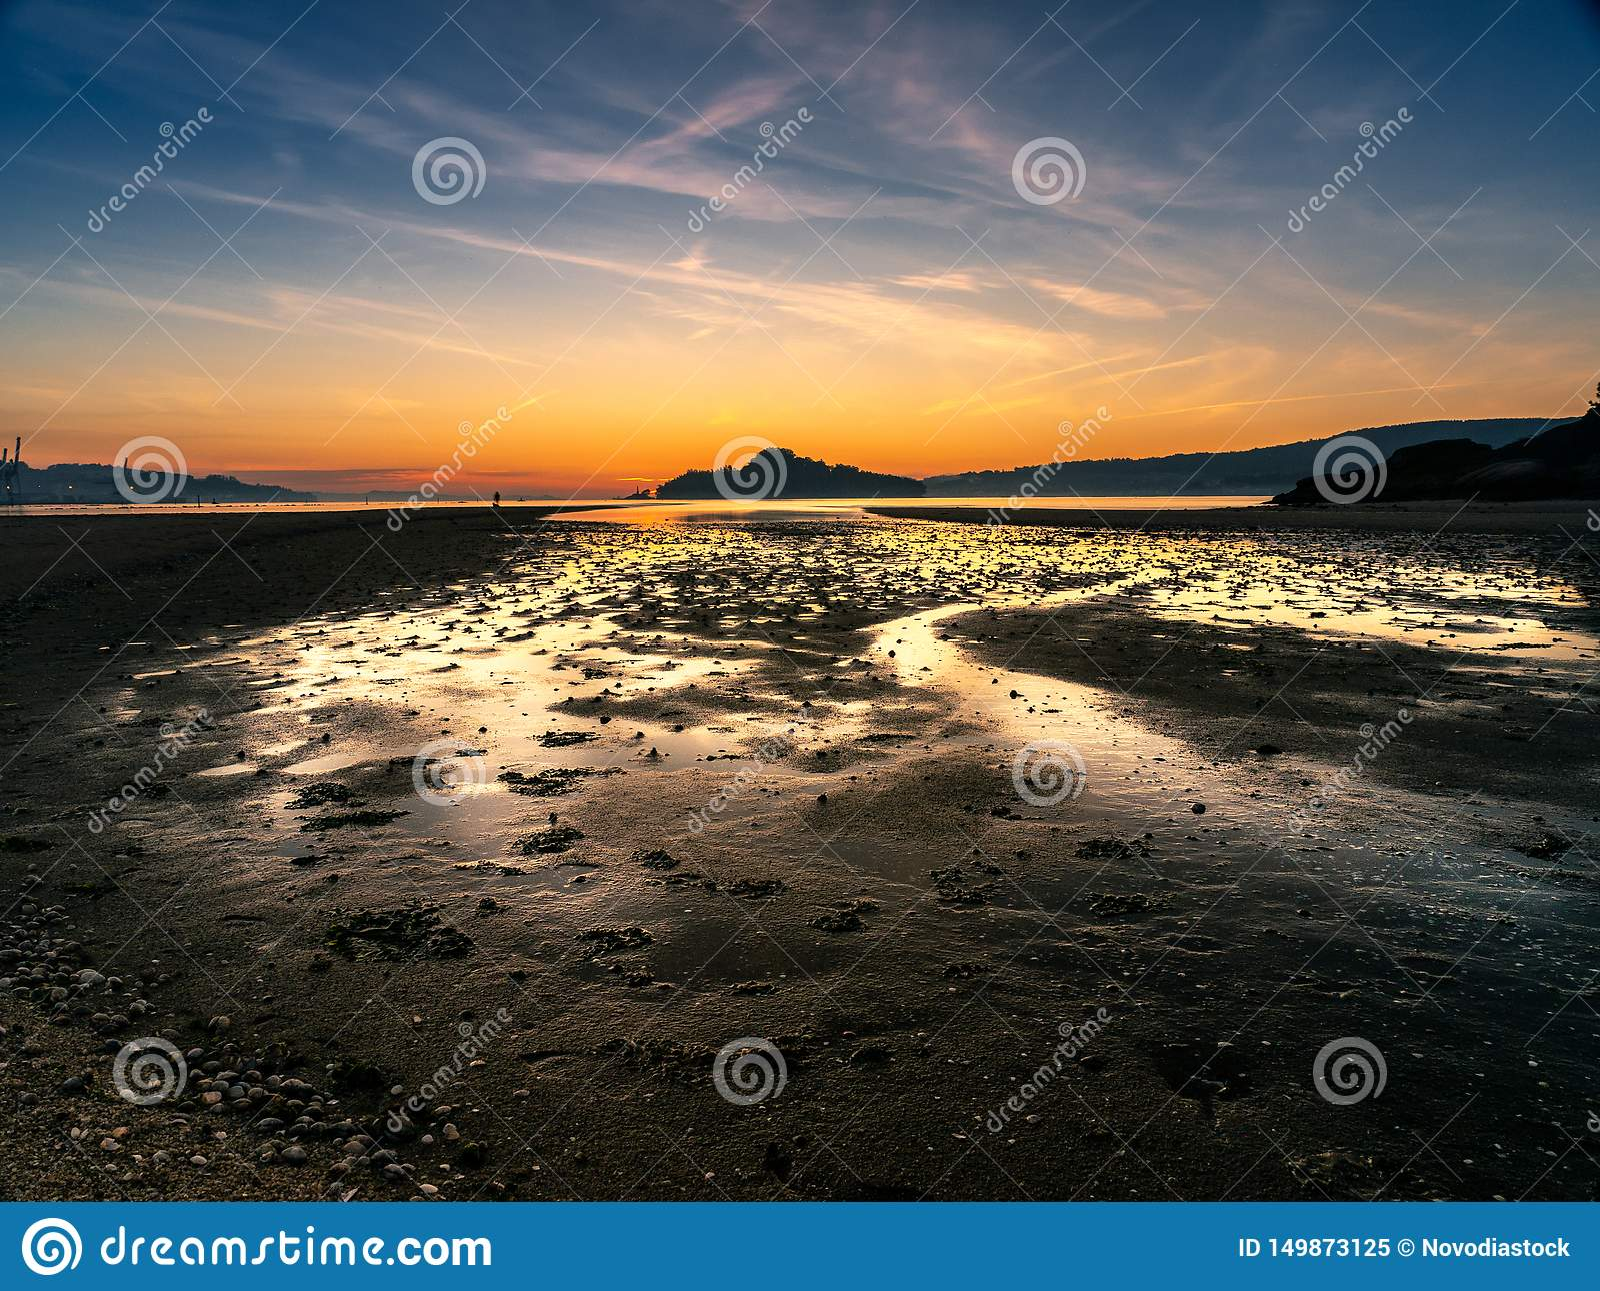 Goldene Stunde bei Ria de Pontevedra, Spanien